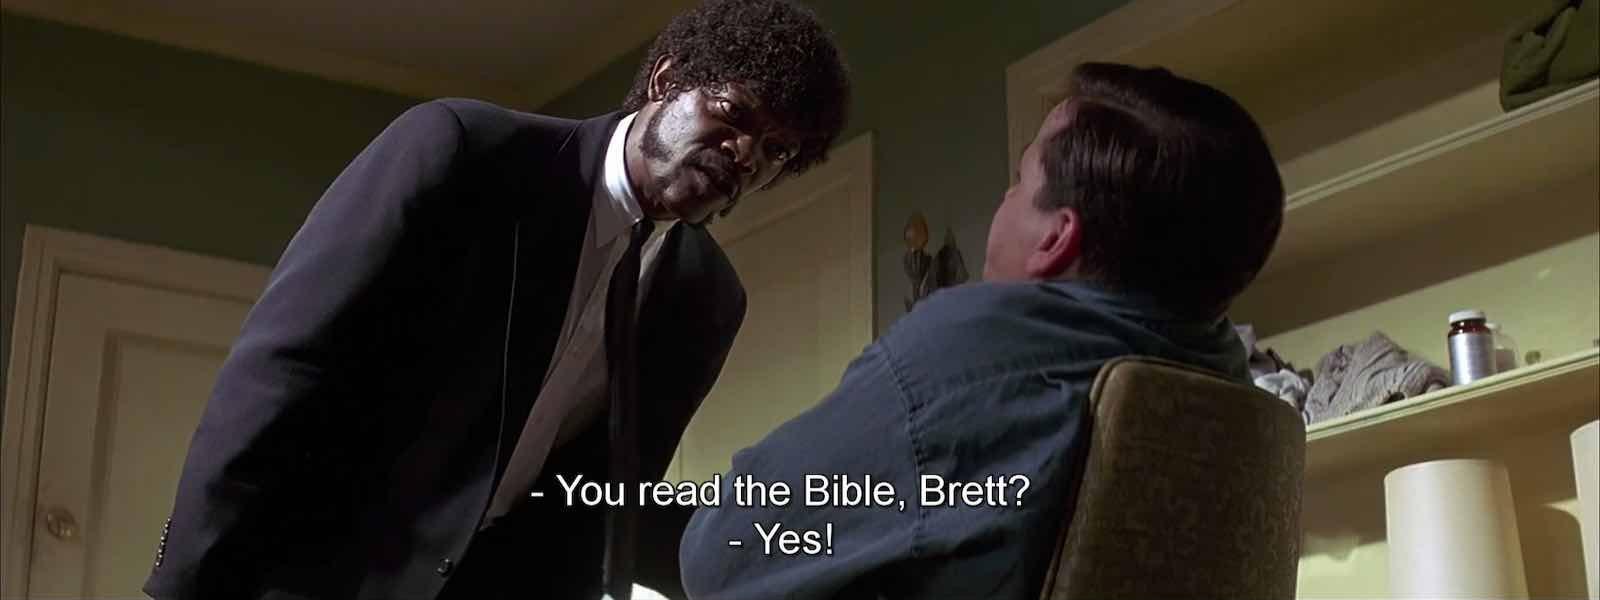 dialogue in pulp fiction - scene starring Samuel l. Jackson